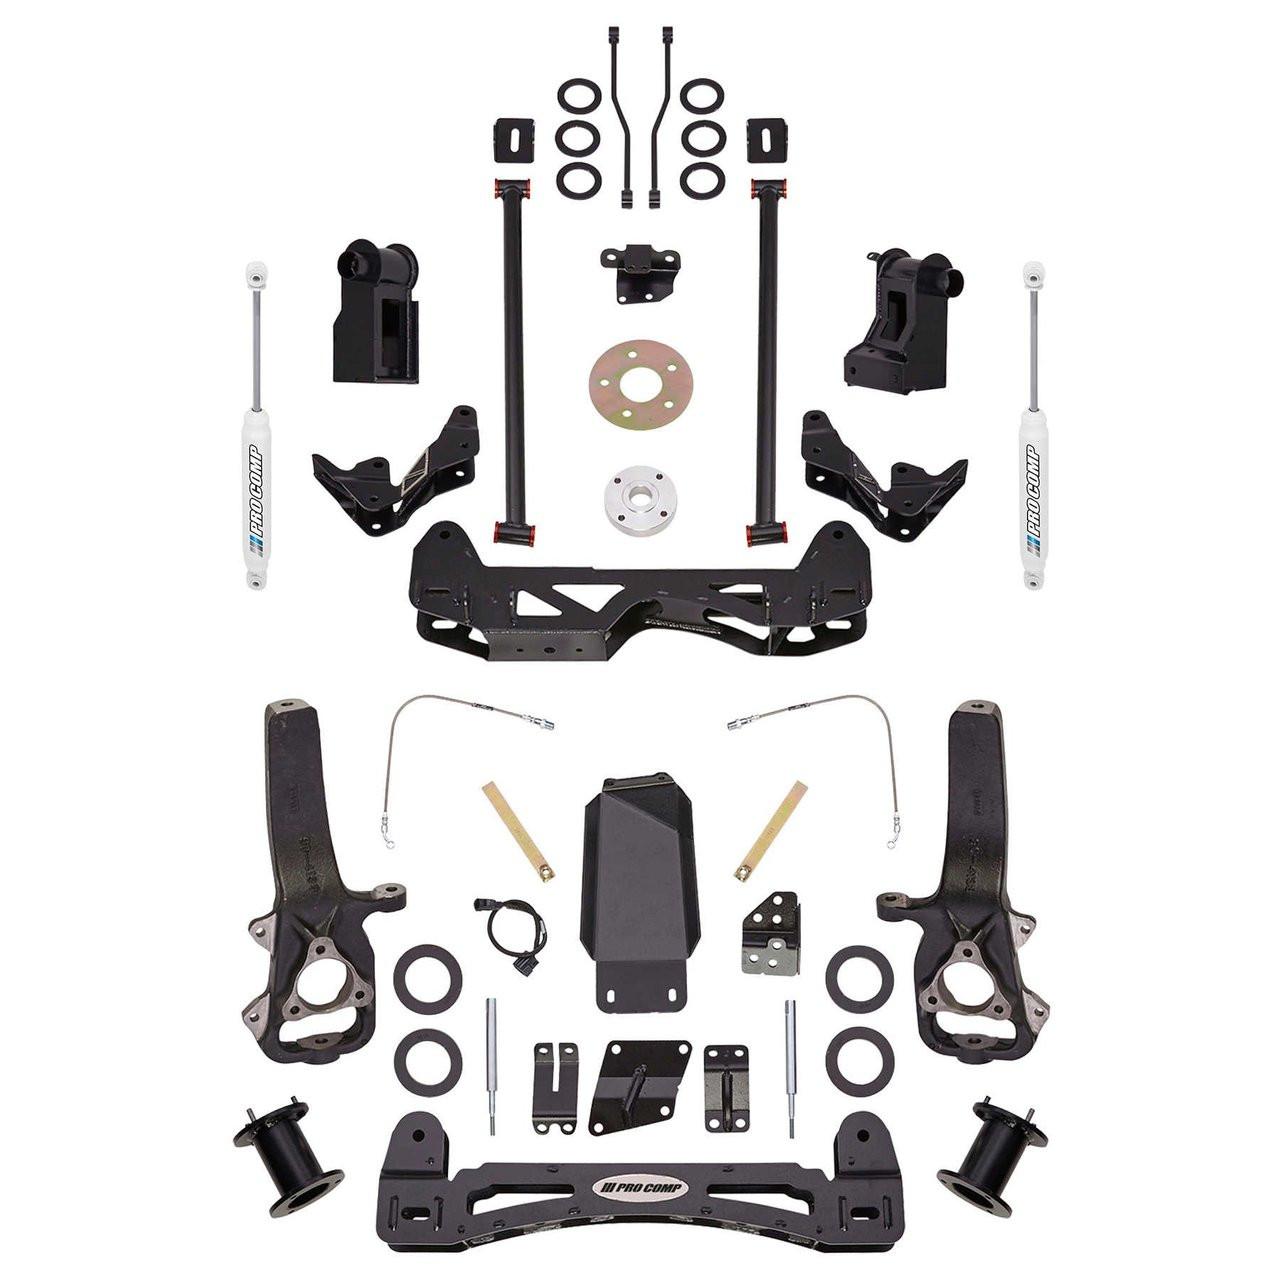 Pro Comp 61252 2.0 Rear Suspension Block Kit for Dodge Ram 1500